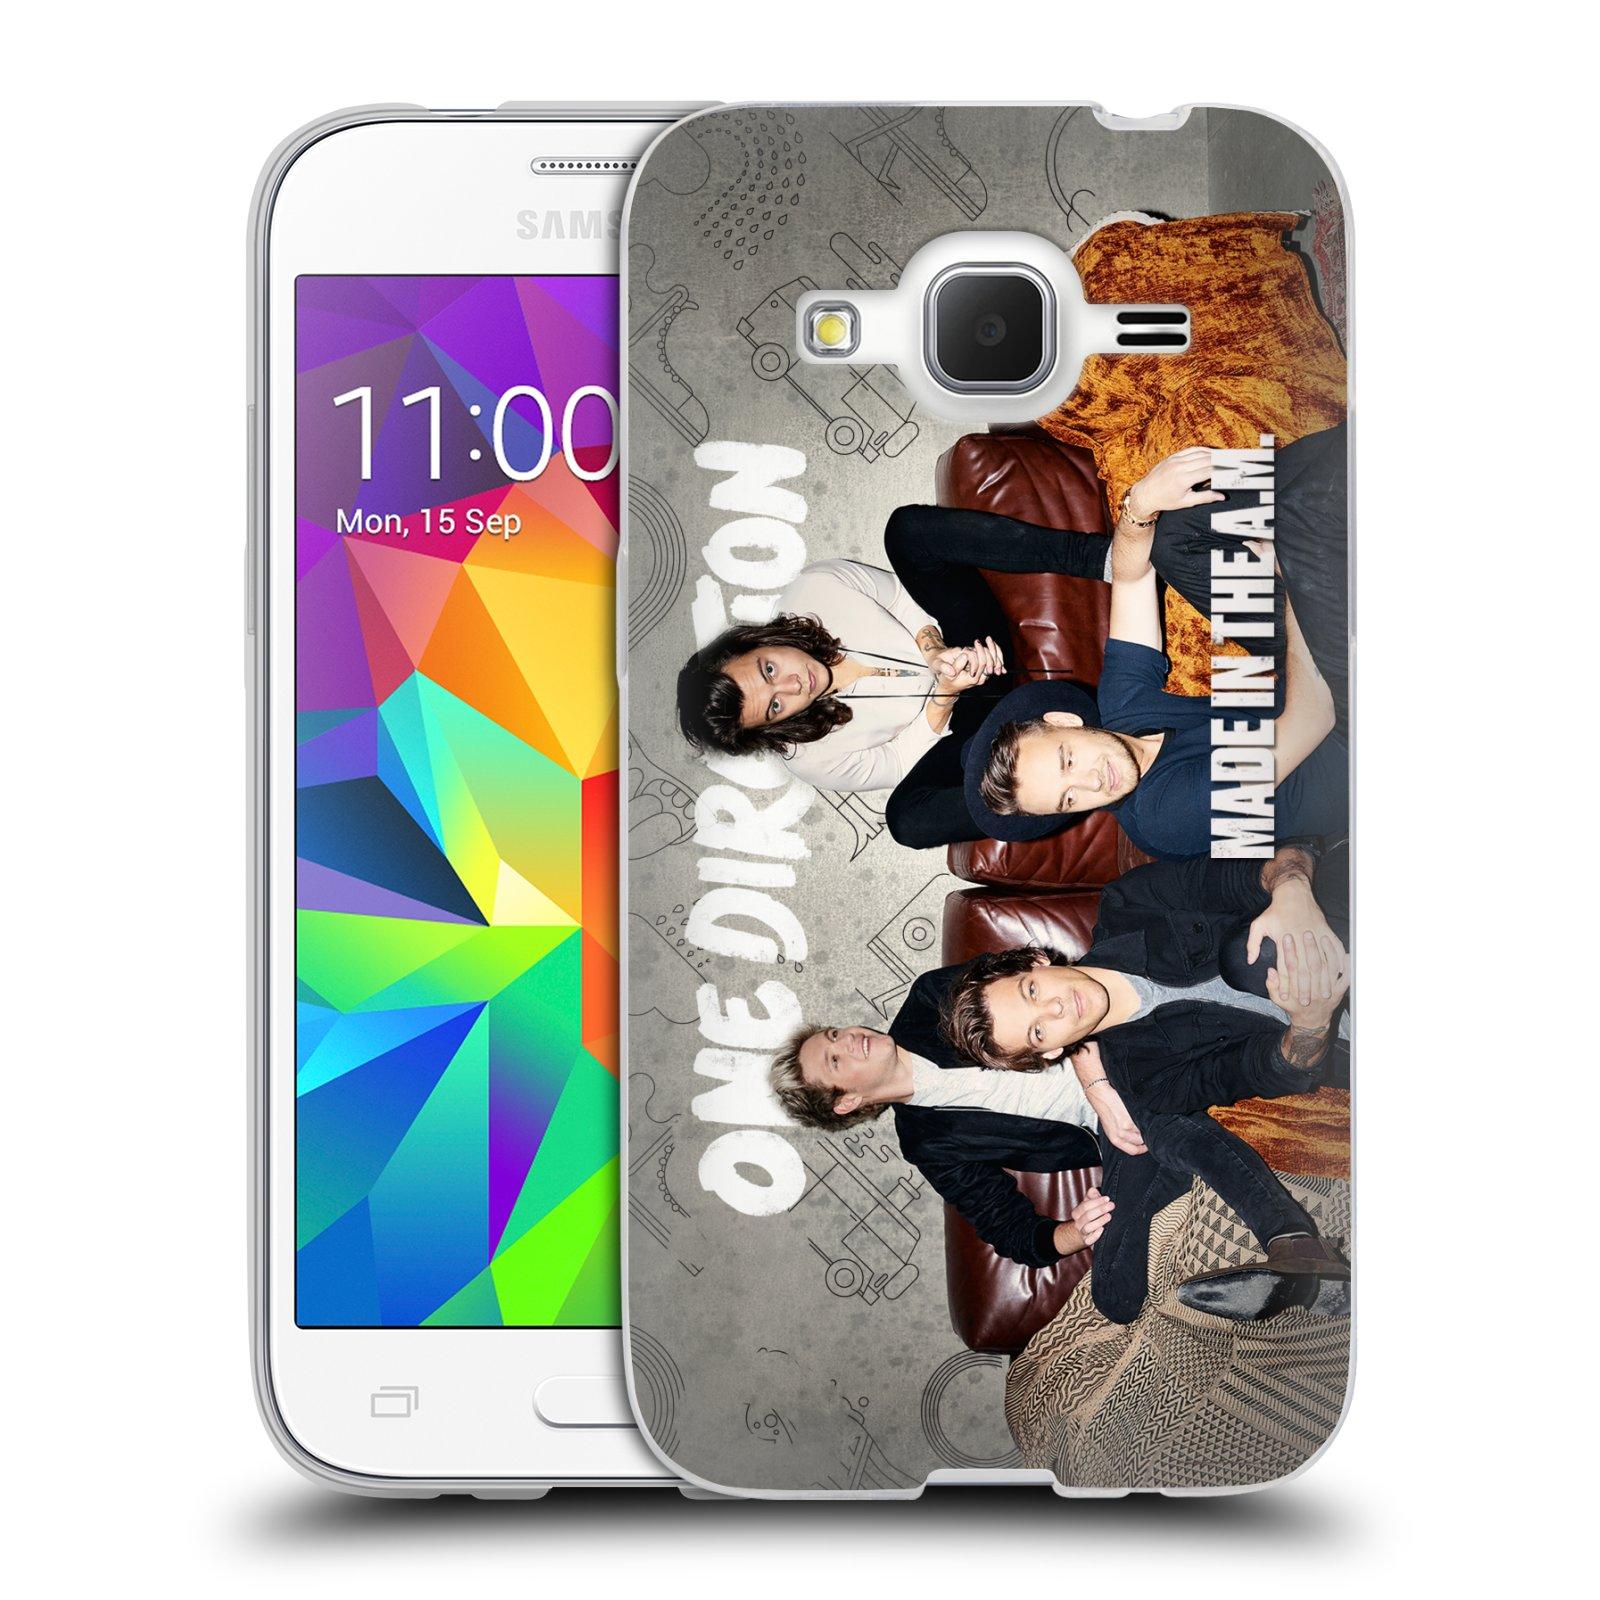 HEAD CASE silikonový obal na mobil Samsung Galaxy Core Prime (G360) chlapecká skupina One Direction gauč